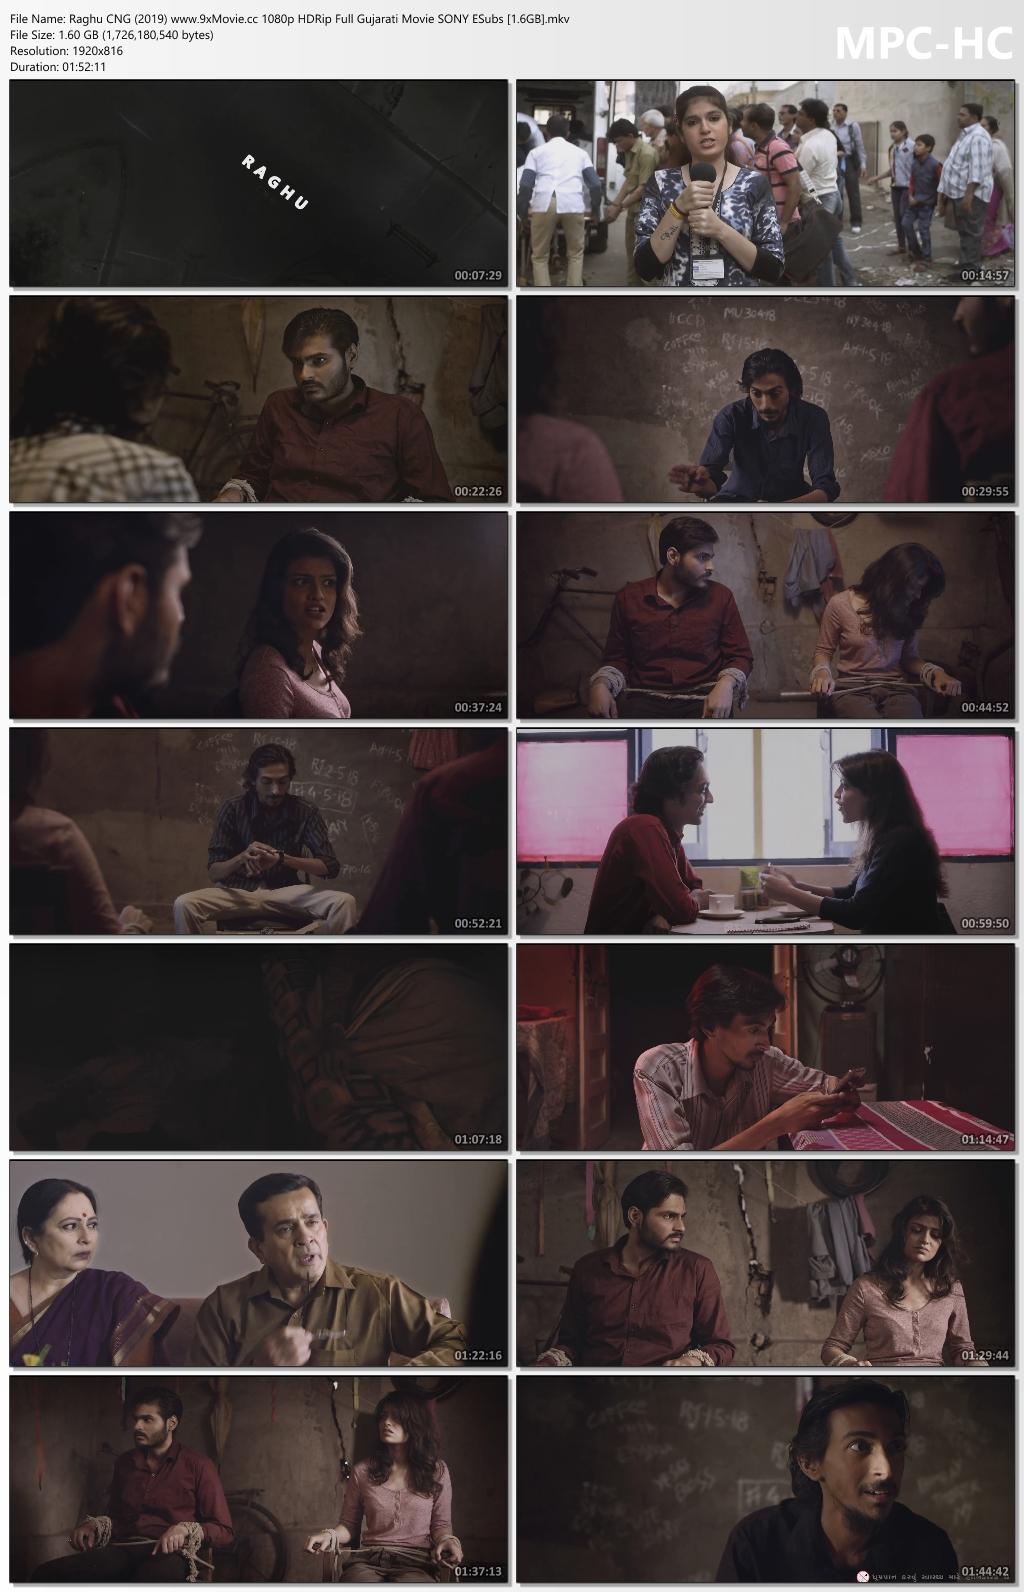 Raghu-CNG-2019-www-9x-Movie-cc-1080p-HDRip-Full-Gujarati-Movie-SONY-ESubs-1-6-GB-mkv